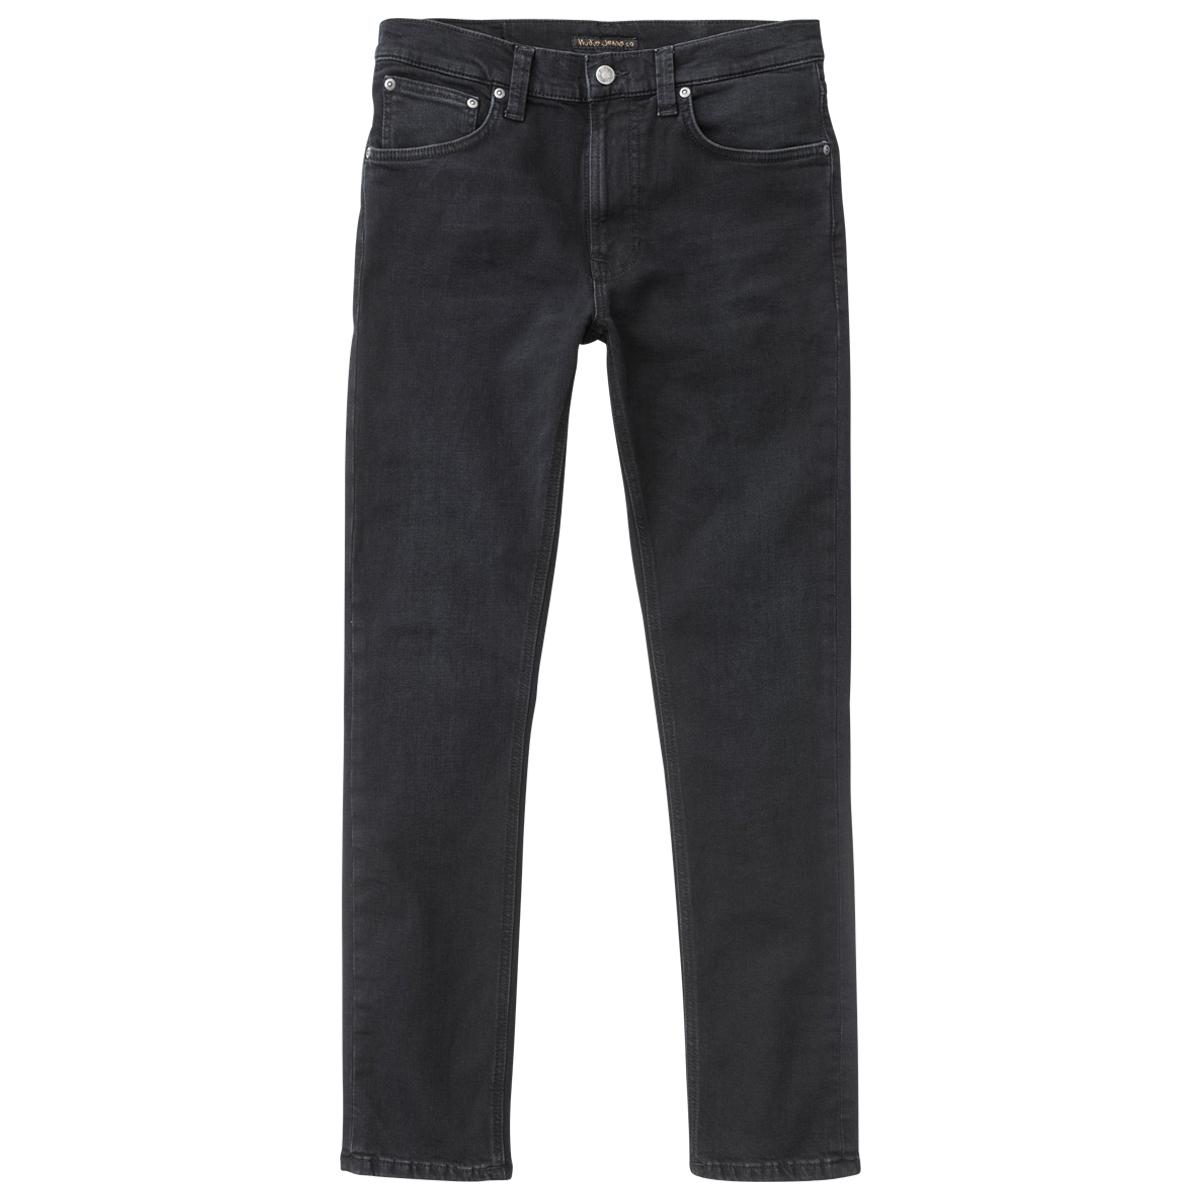 Nudie Jeans Co Lean Dean Black Out L30